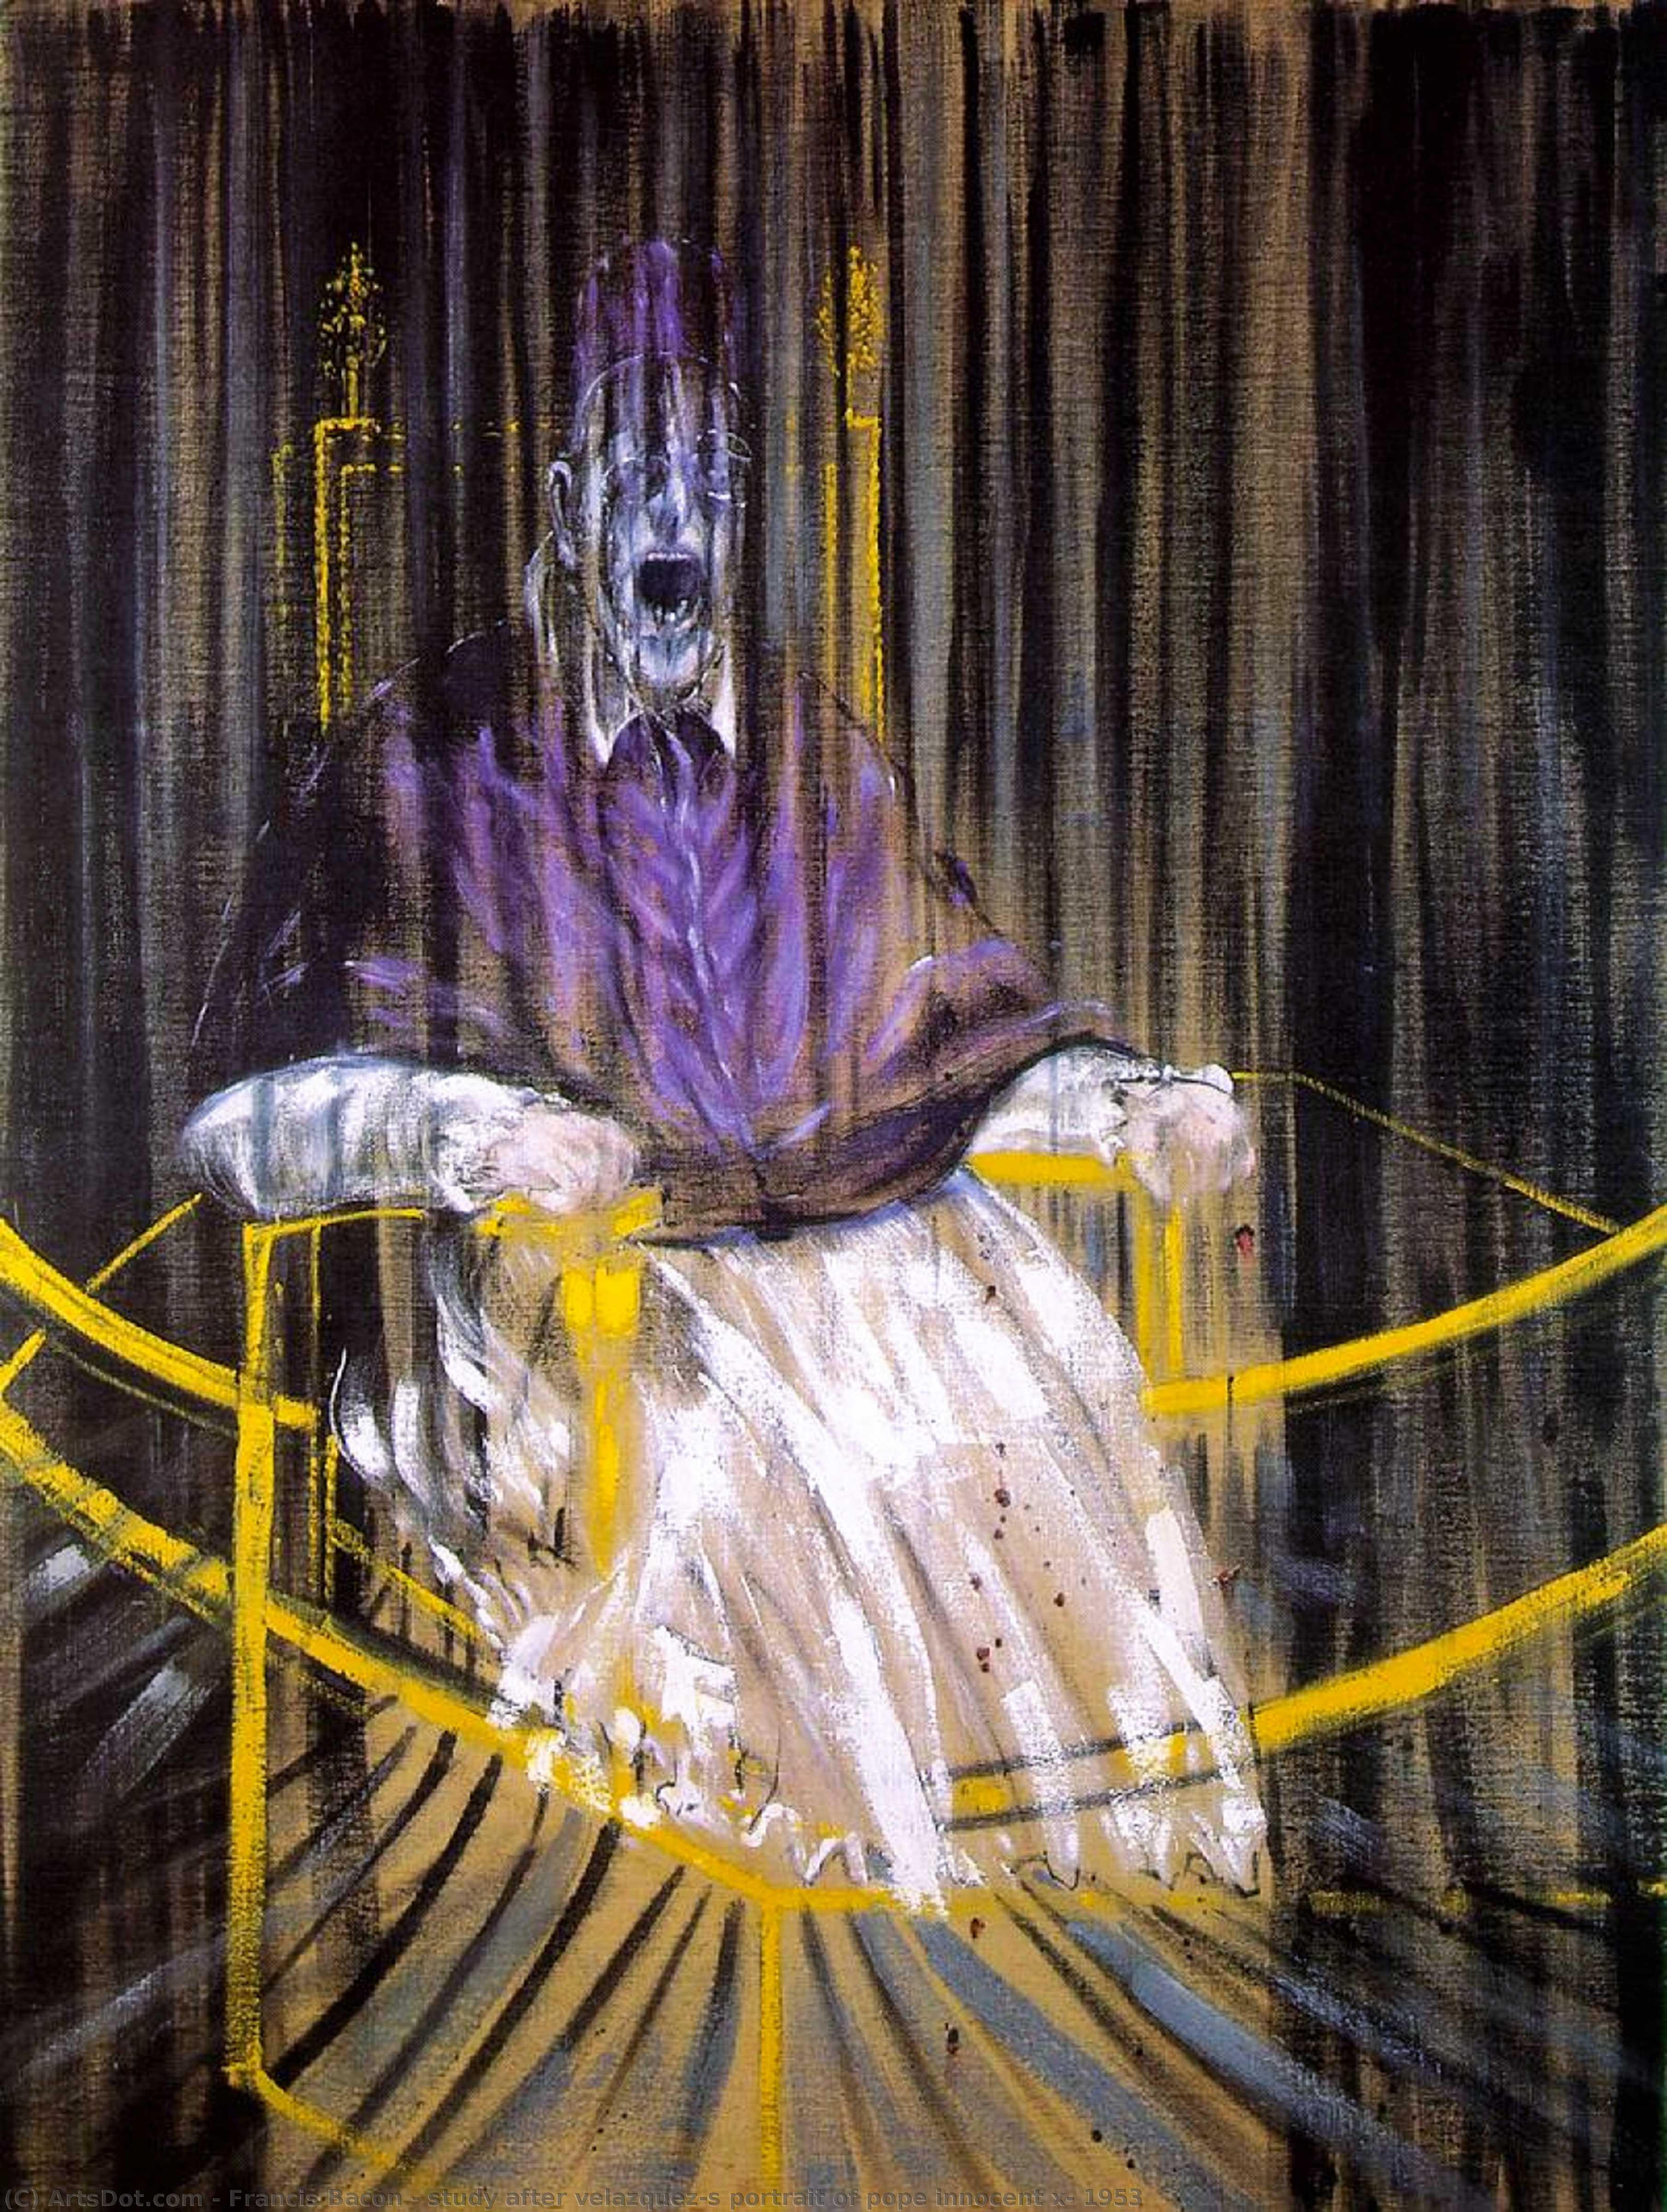 Wikoo.org - موسوعة الفنون الجميلة - اللوحة، العمل الفني Francis Bacon - study after velazquez's portrait of pope innocent x, 1953